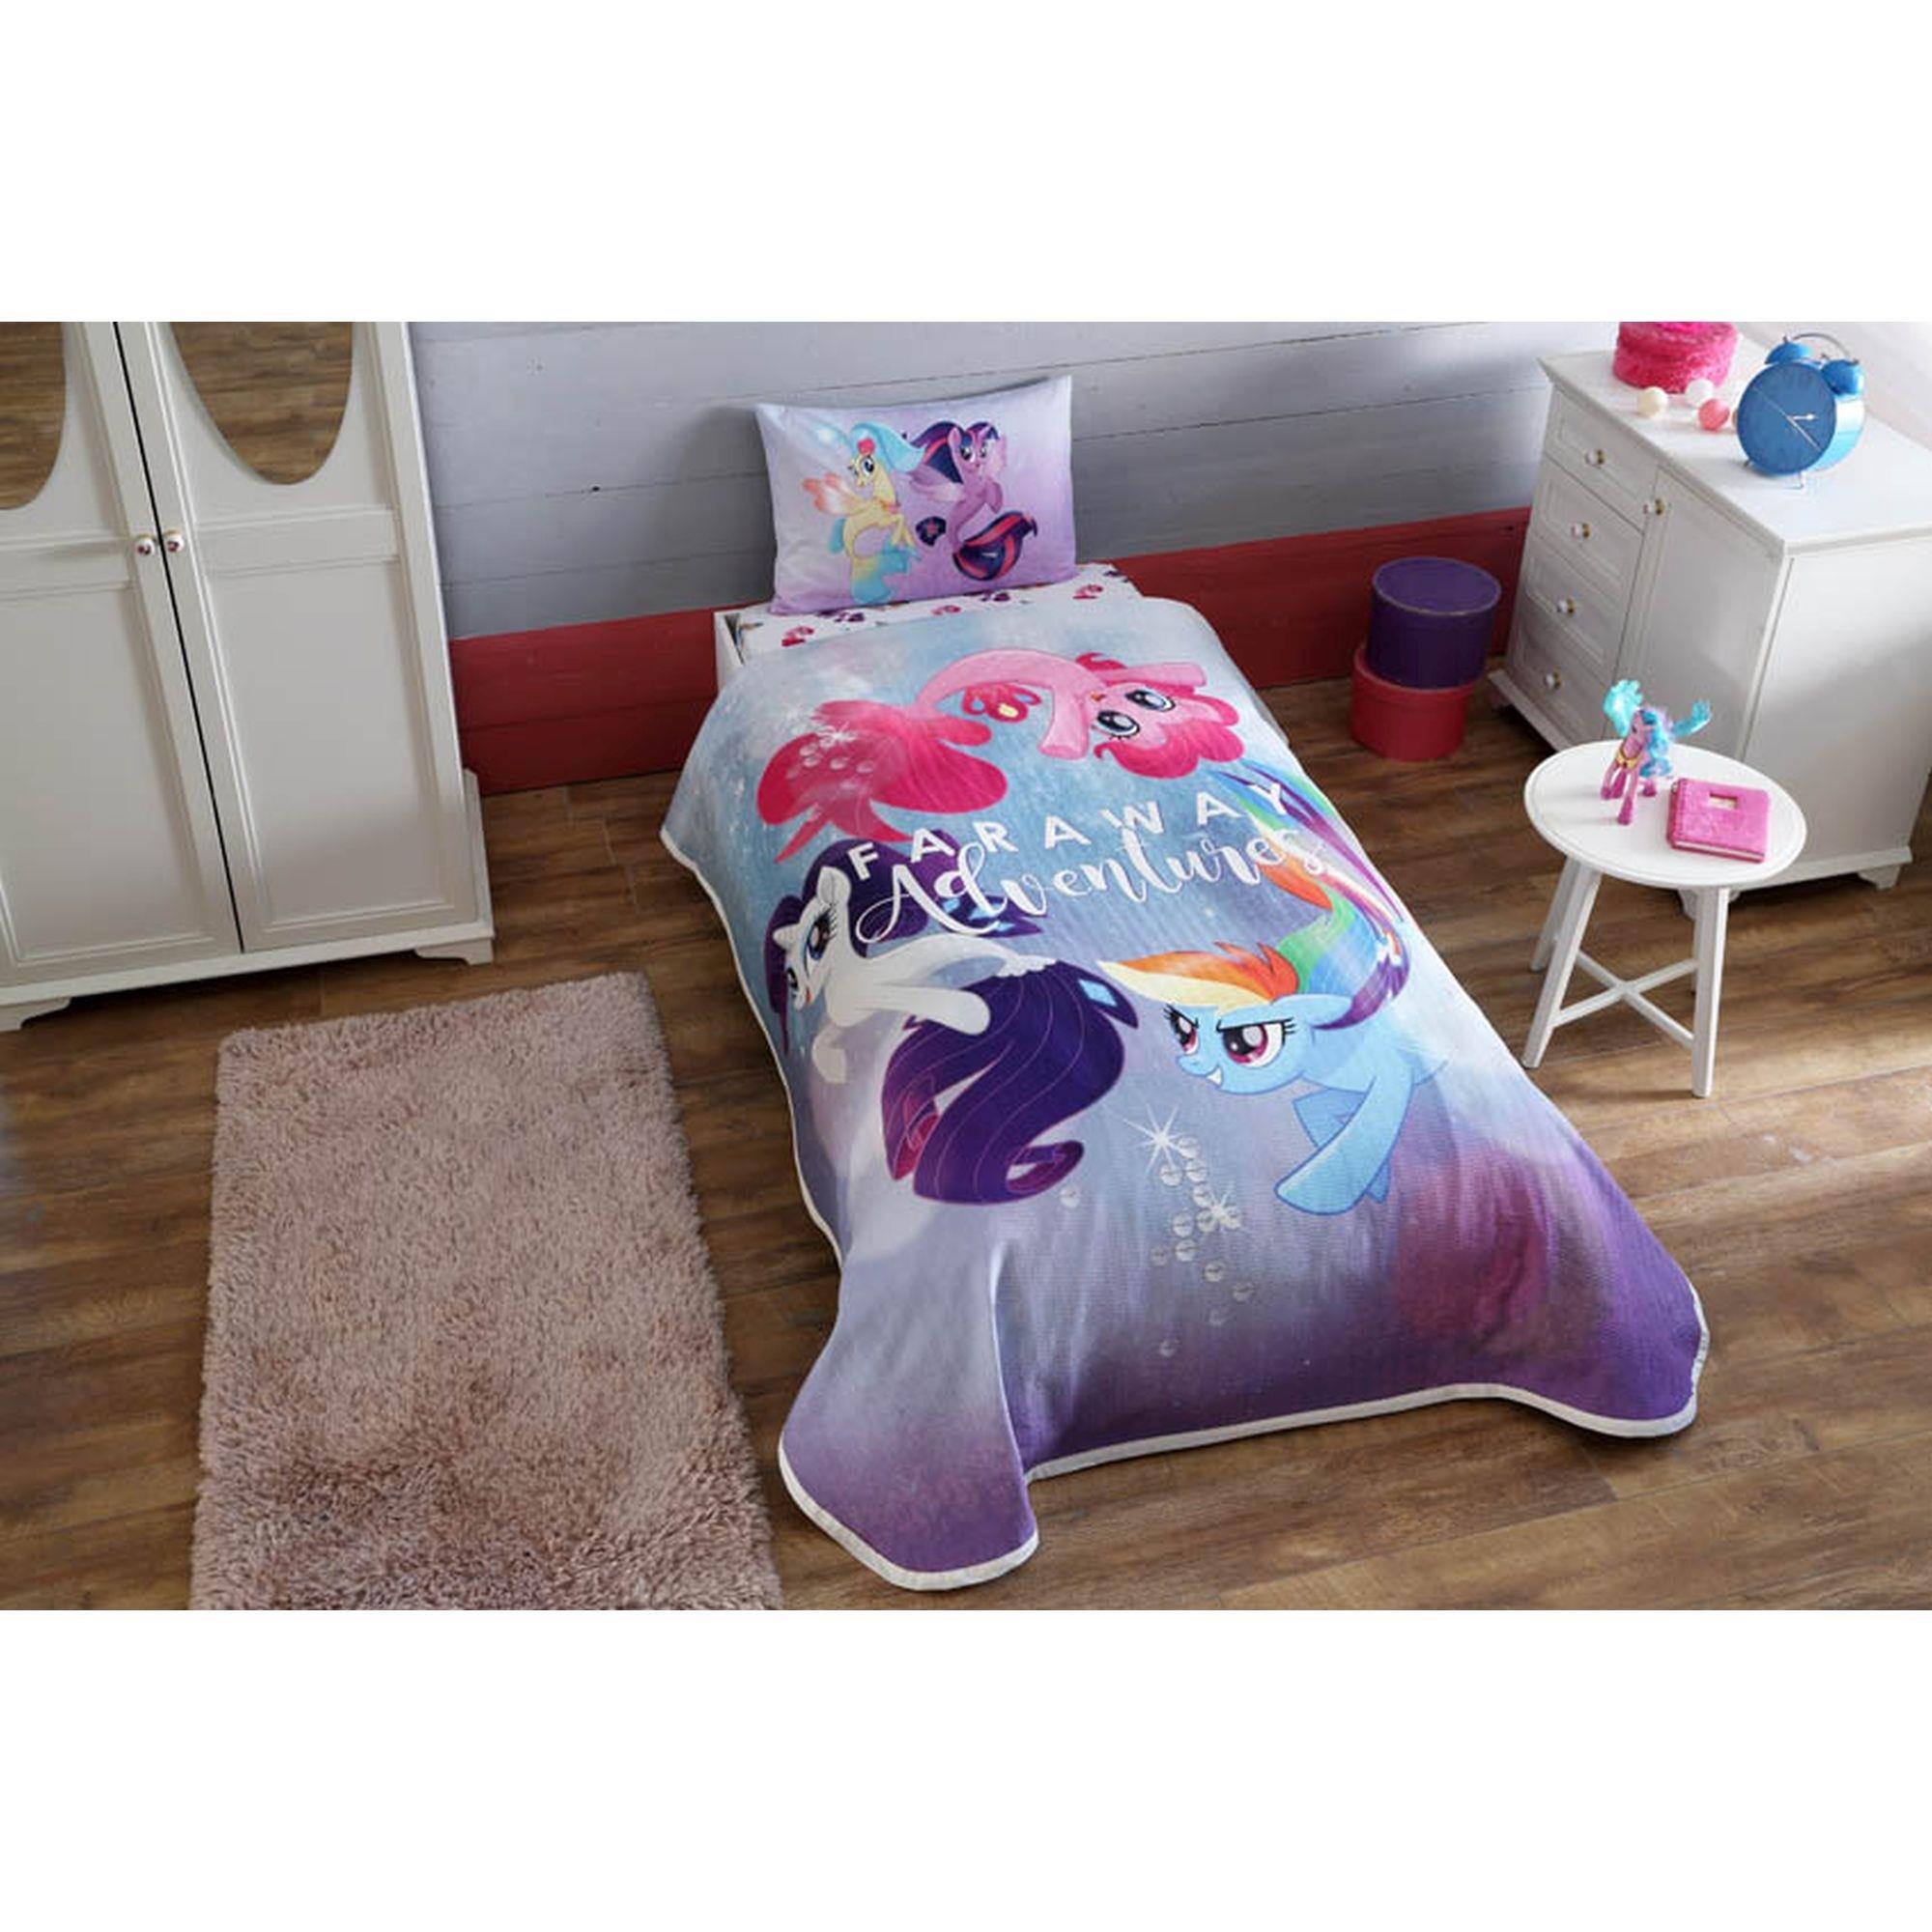 3-Piece My Little Pony Movie Licensed Cartoons Bedspread Coverlet (Pique) Set, 100% Pure Cotton Luxury, Children Teenager Single Size